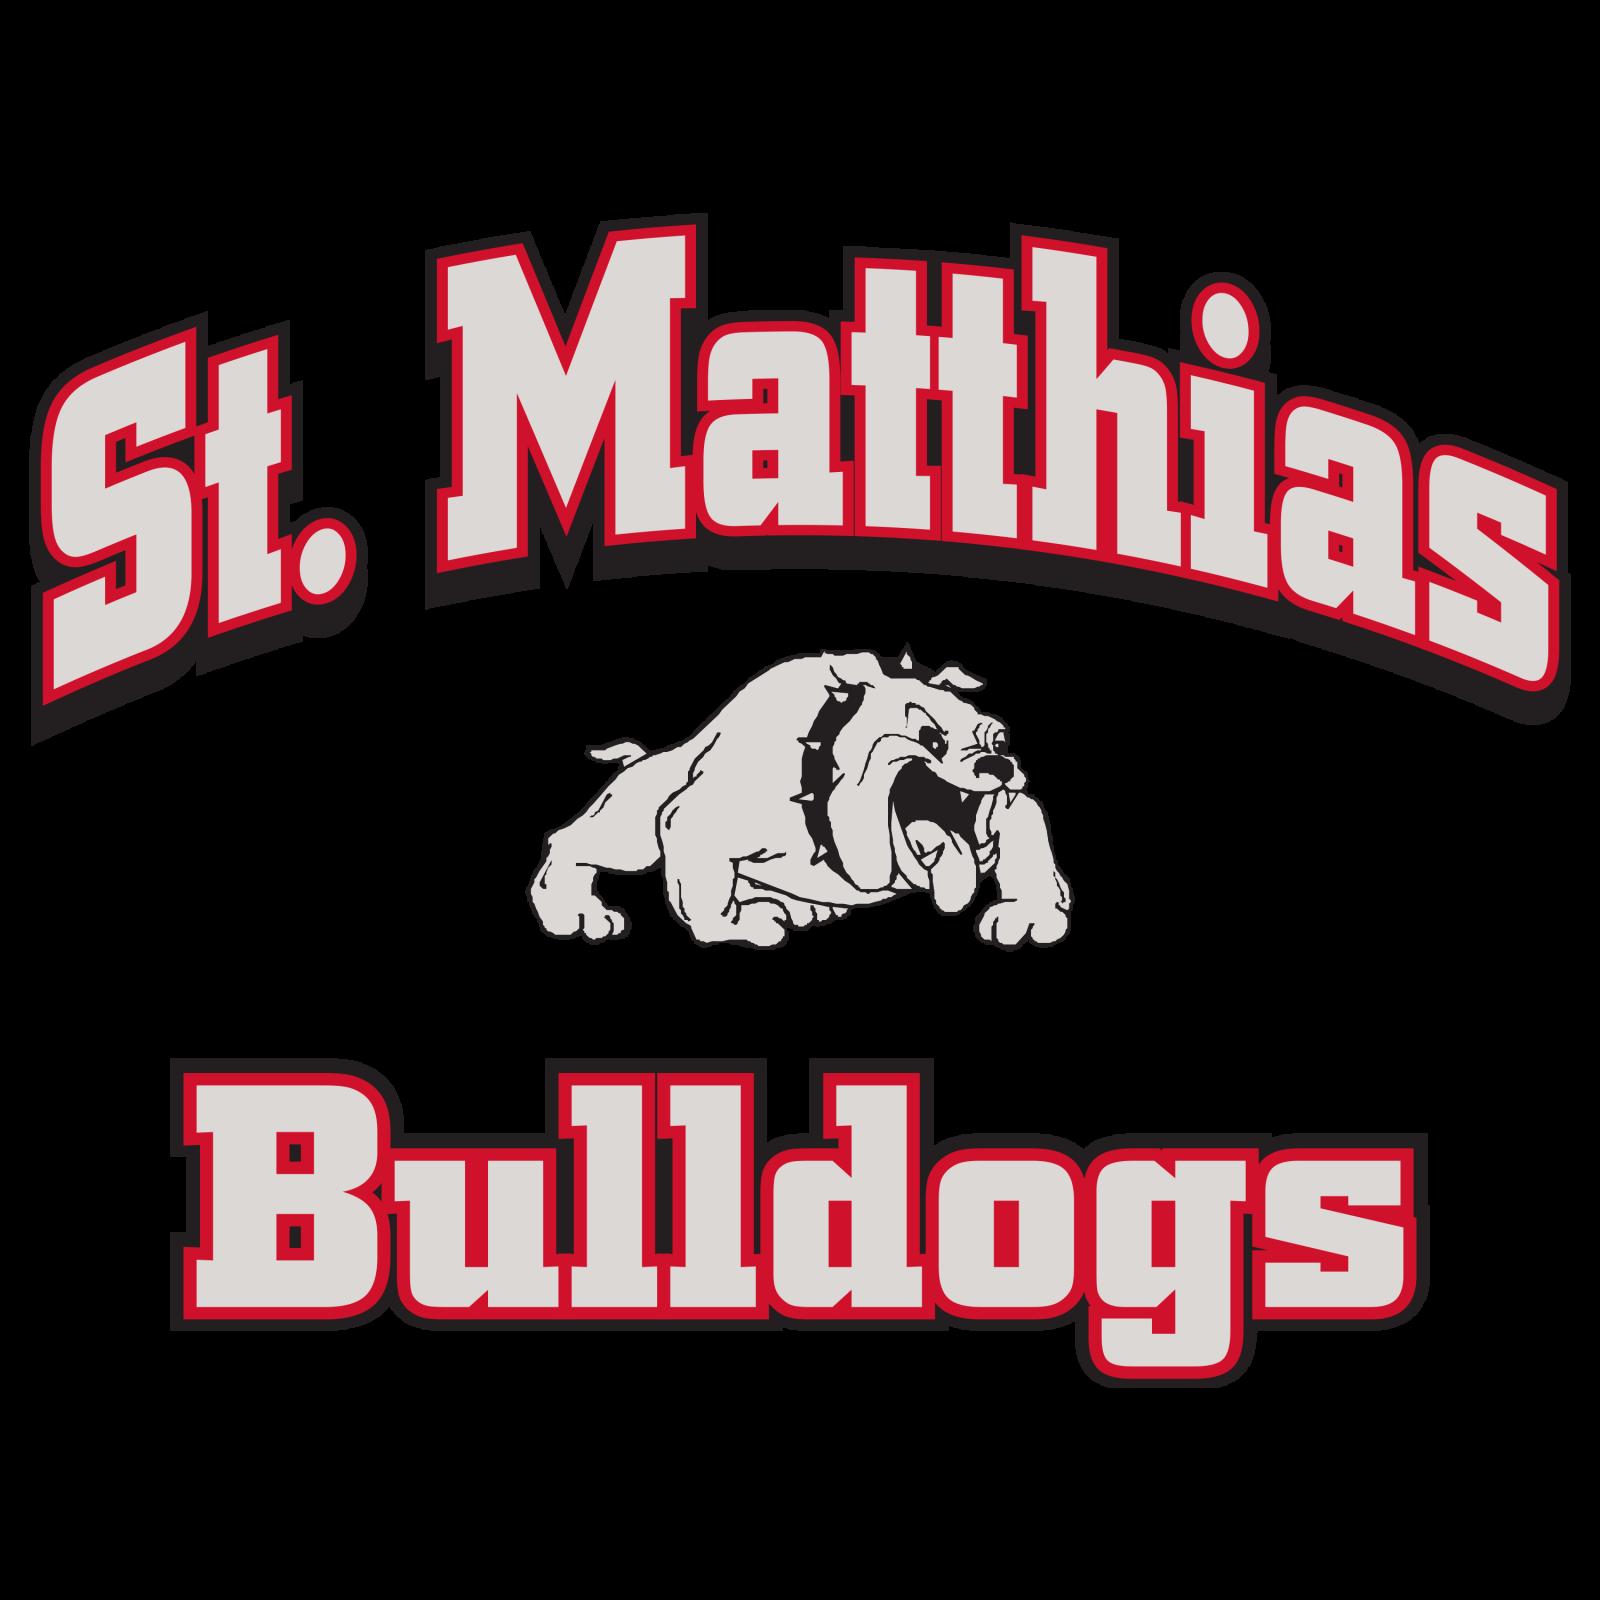 st matthias bulldogs, team spiritwear, dunns sporting goods